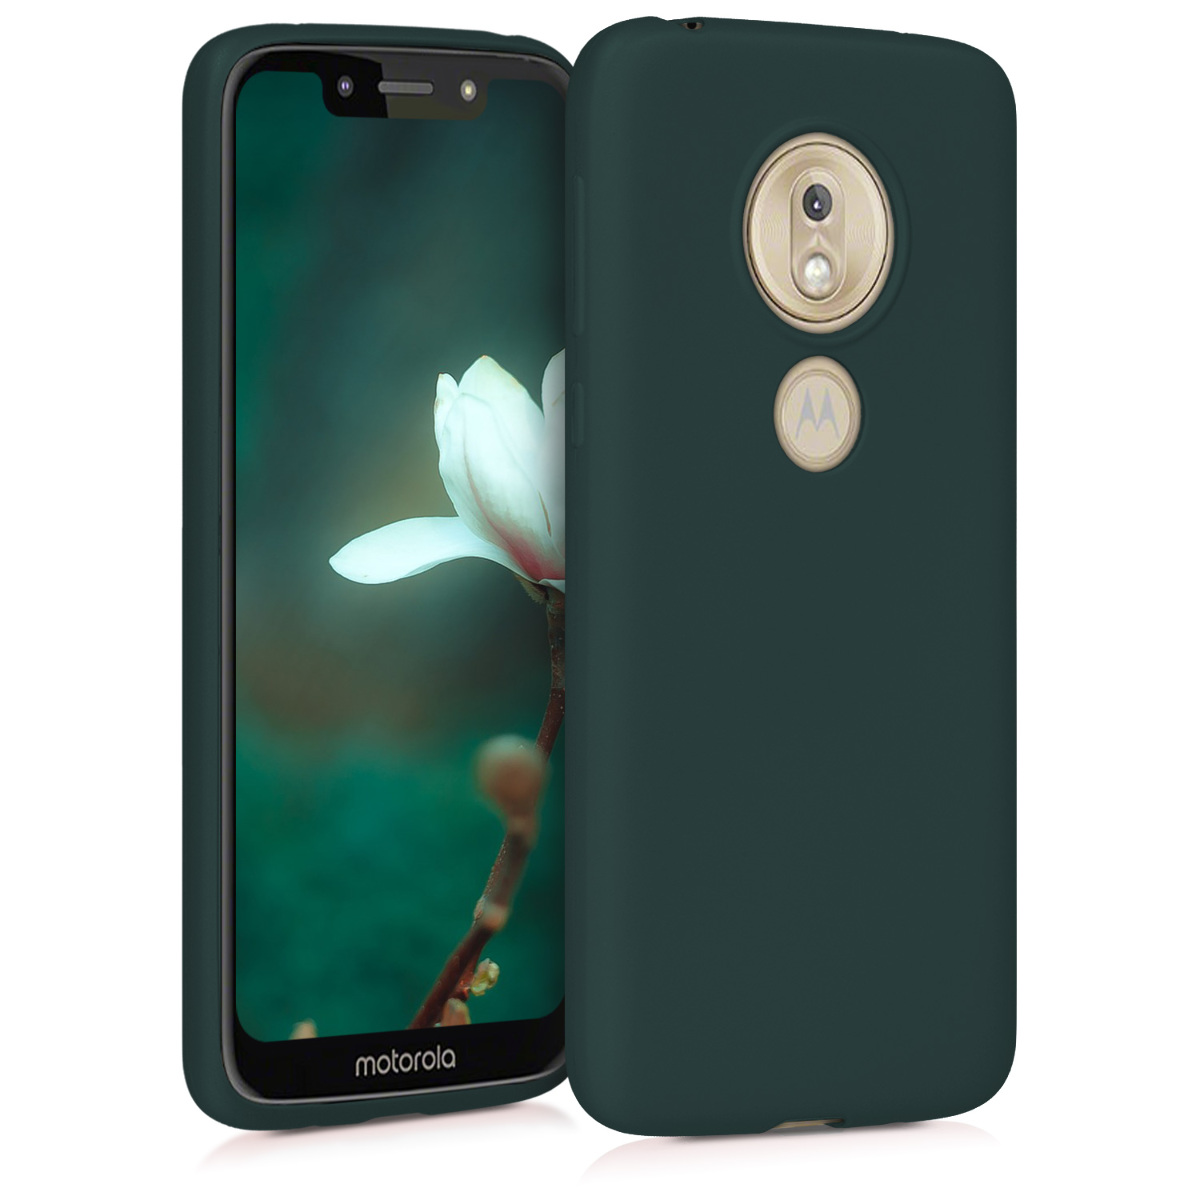 KW Θήκη Σιλικόνης Motorola Moto G7 Play - Metallic Teal (47753.14)